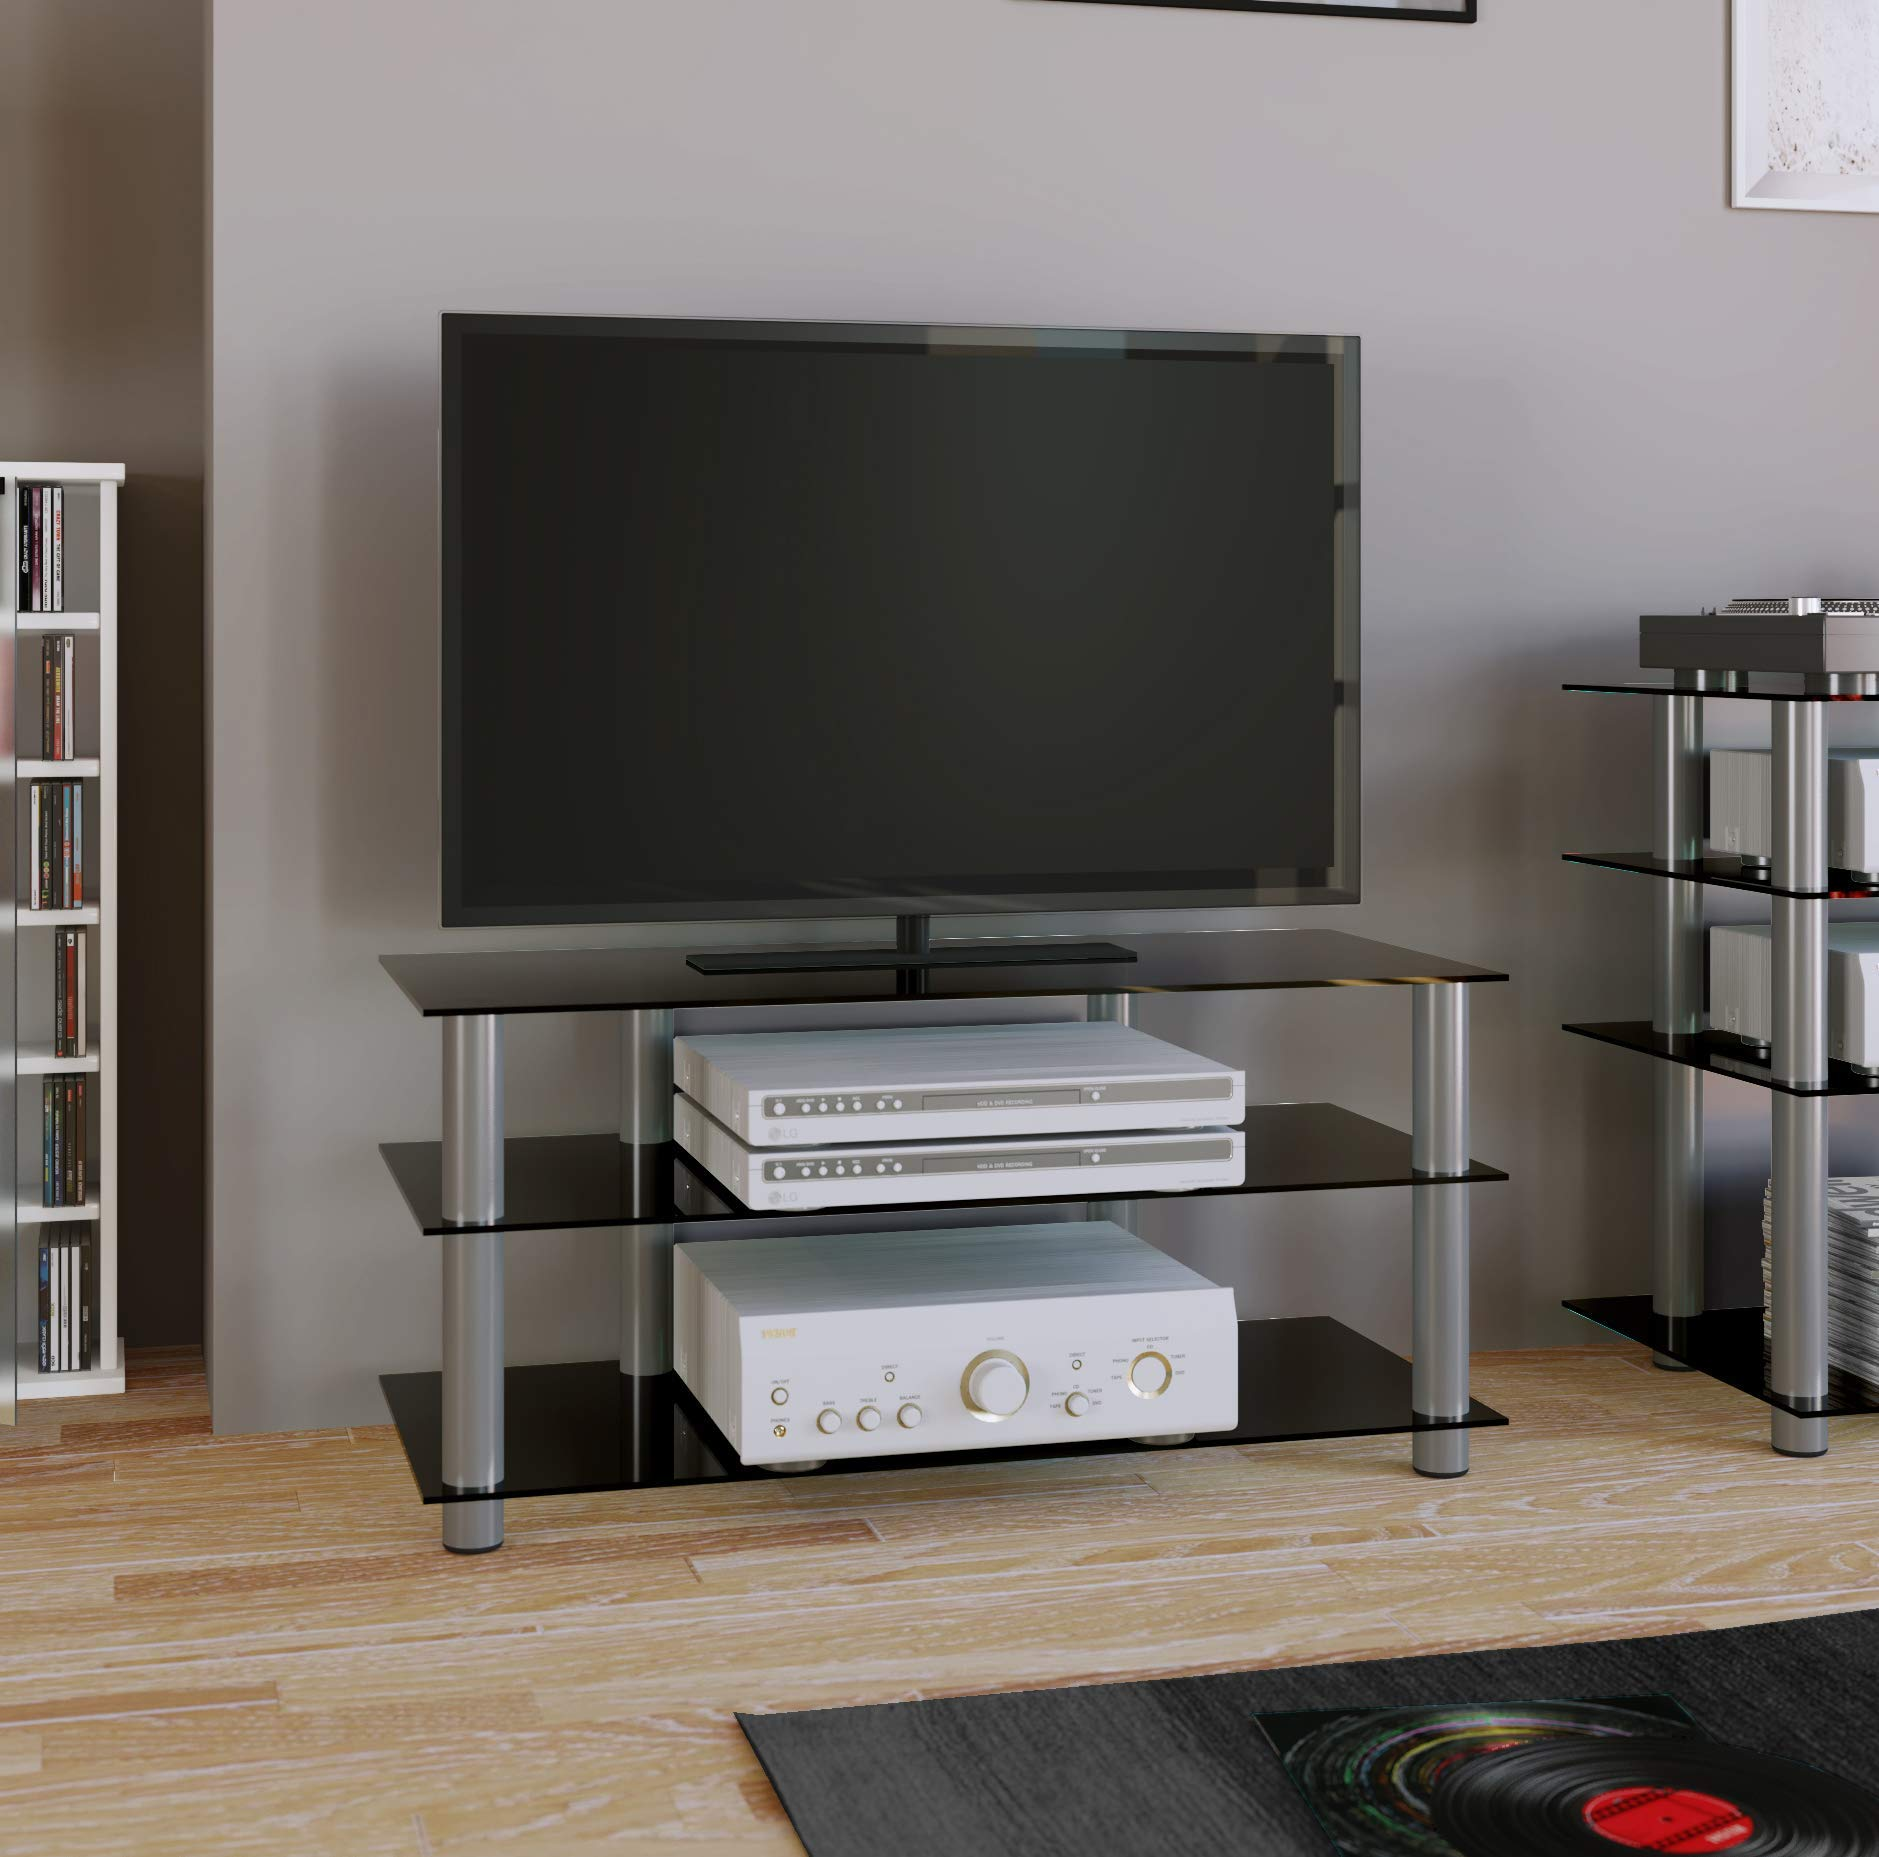 VCM TV Hifi Furniture Lowboard Entertainment Unit Table Shelf Shelves  Aluminium Glass Brass Silver/Clear